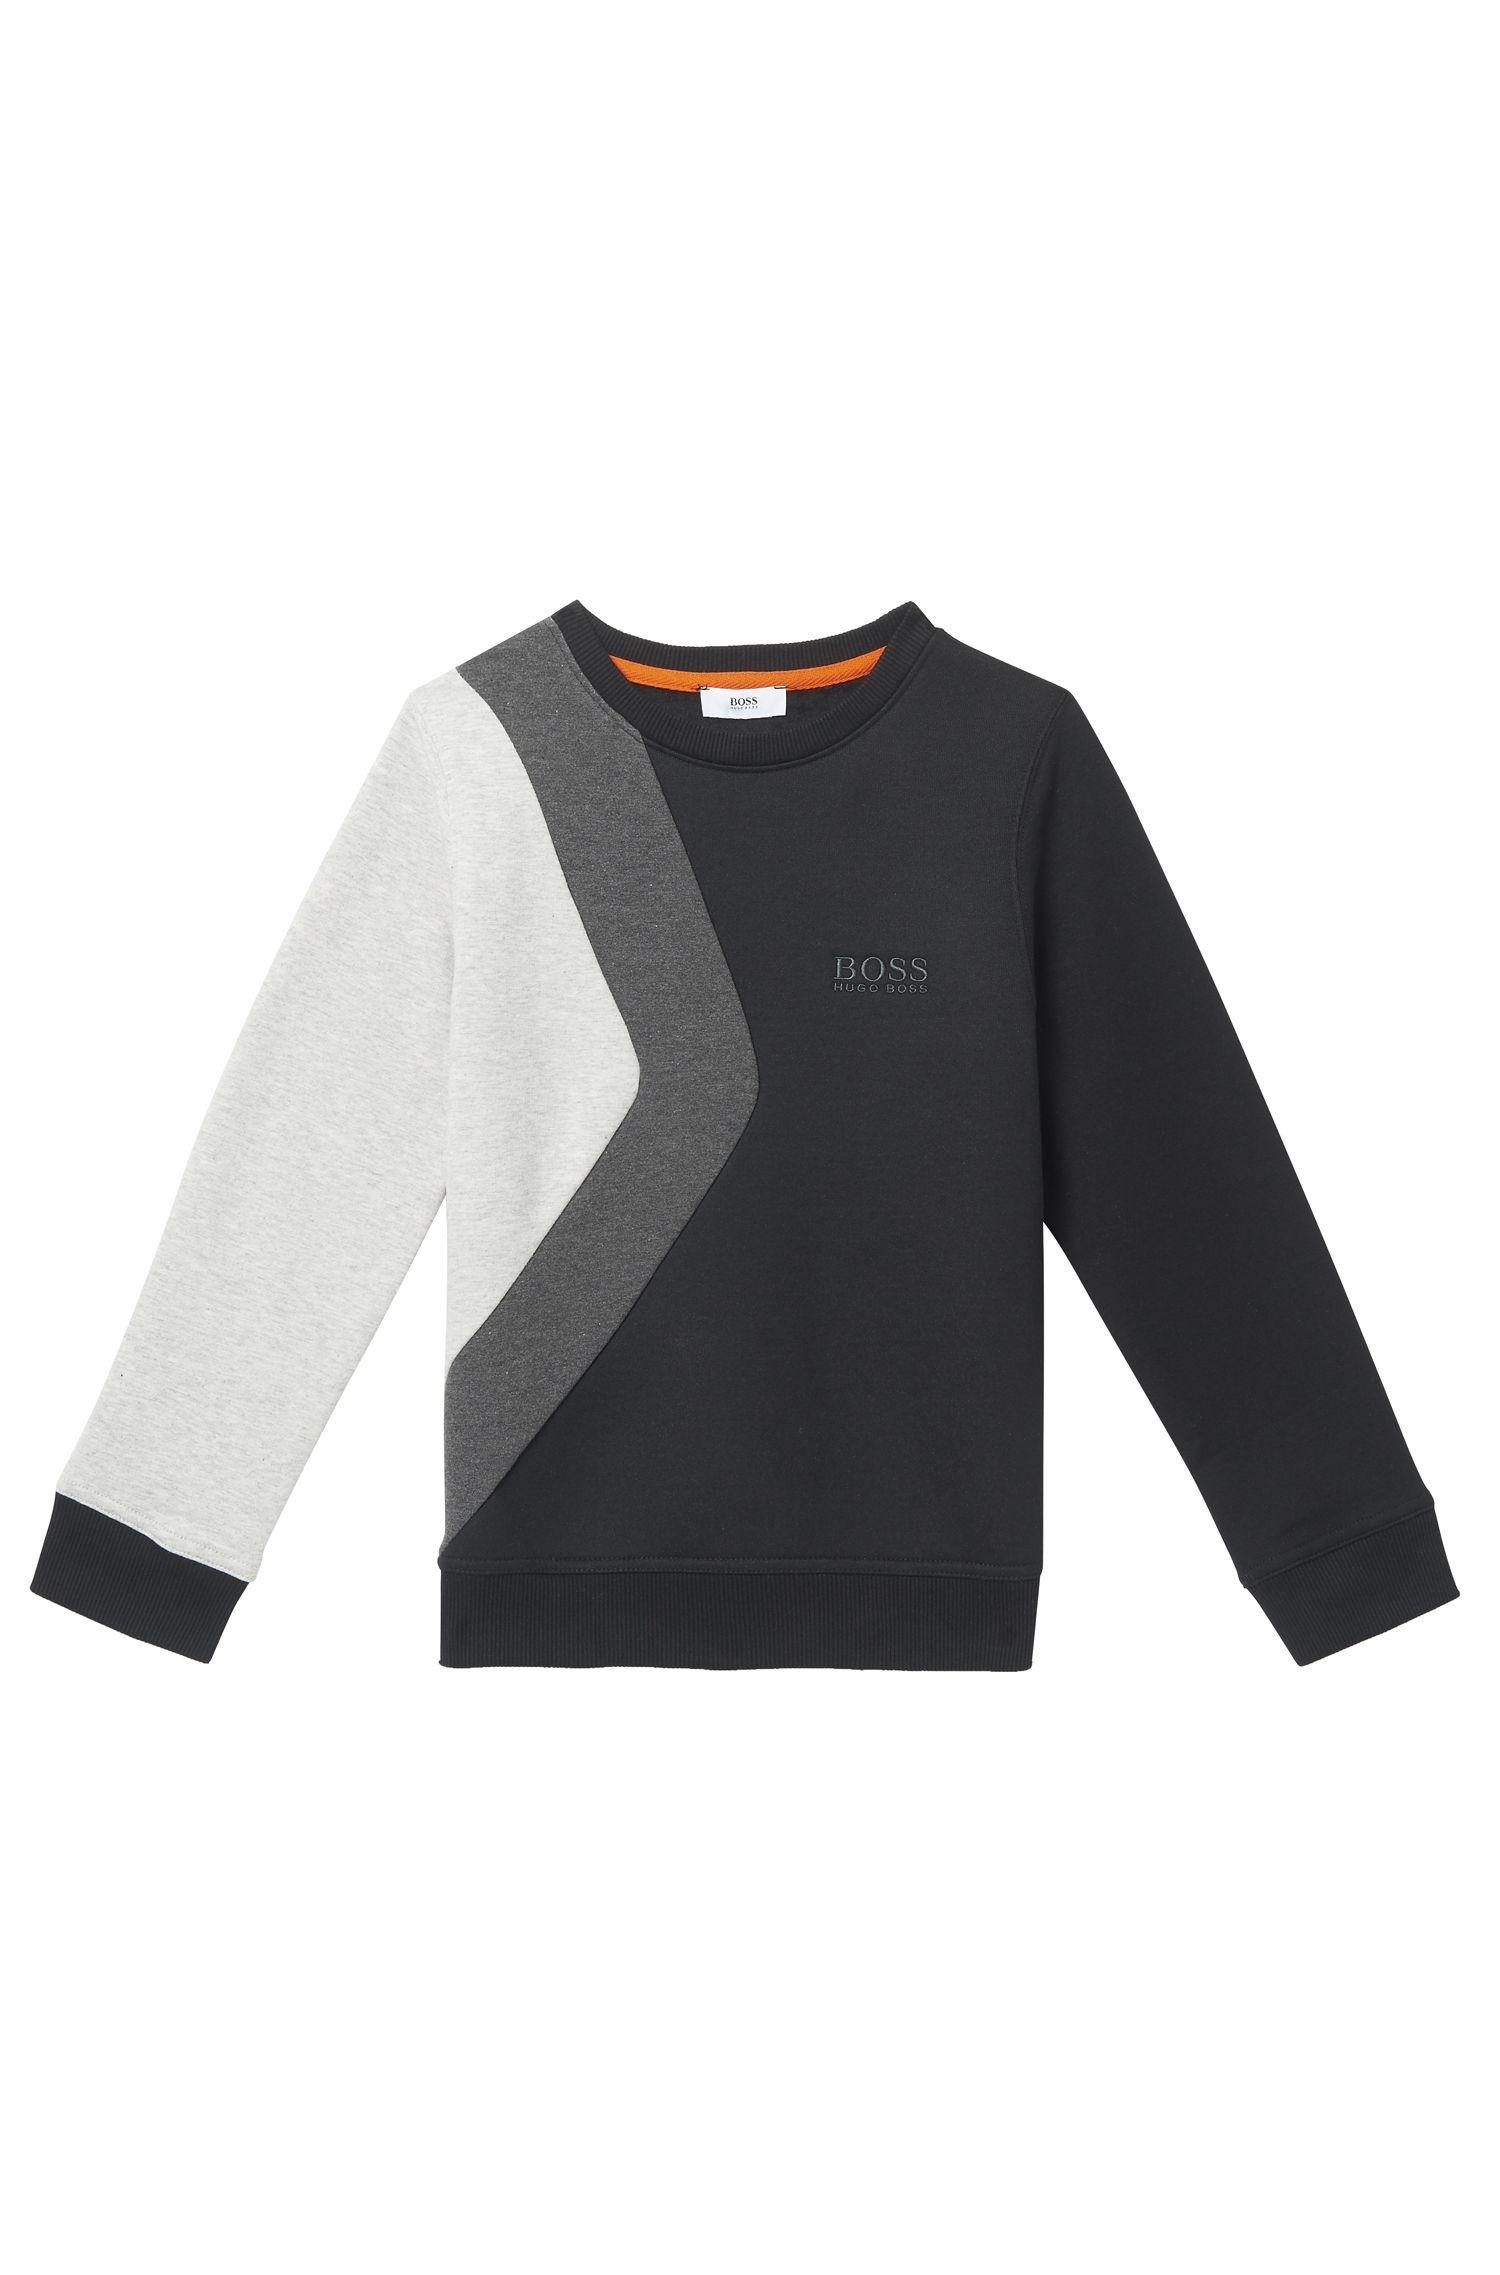 'J25A33' | Boys Cotton Colorblock Sweatshirt